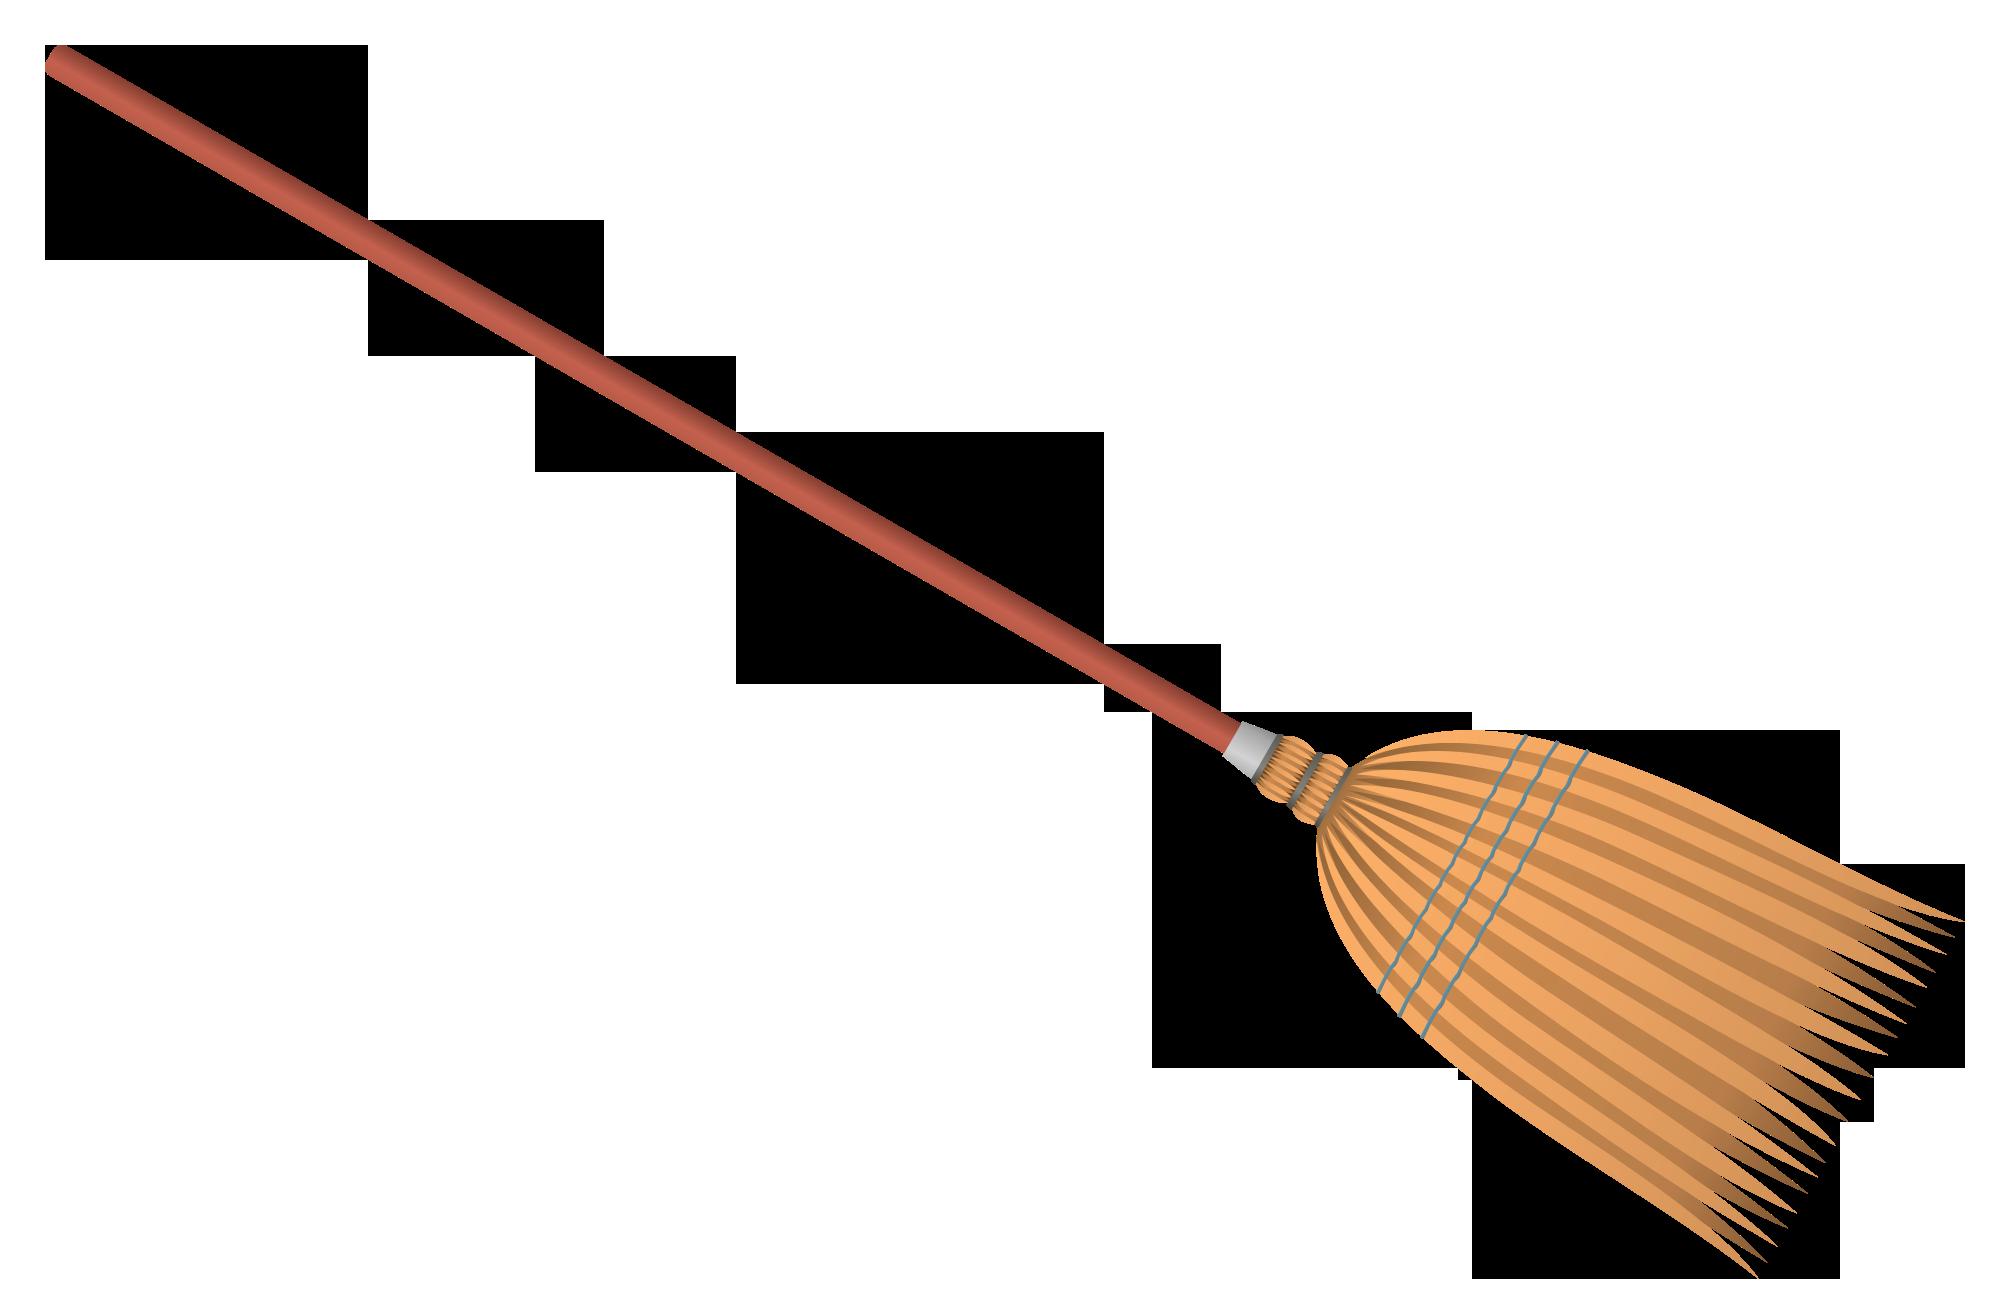 Broom clipart vector. Png transparent image pngpix